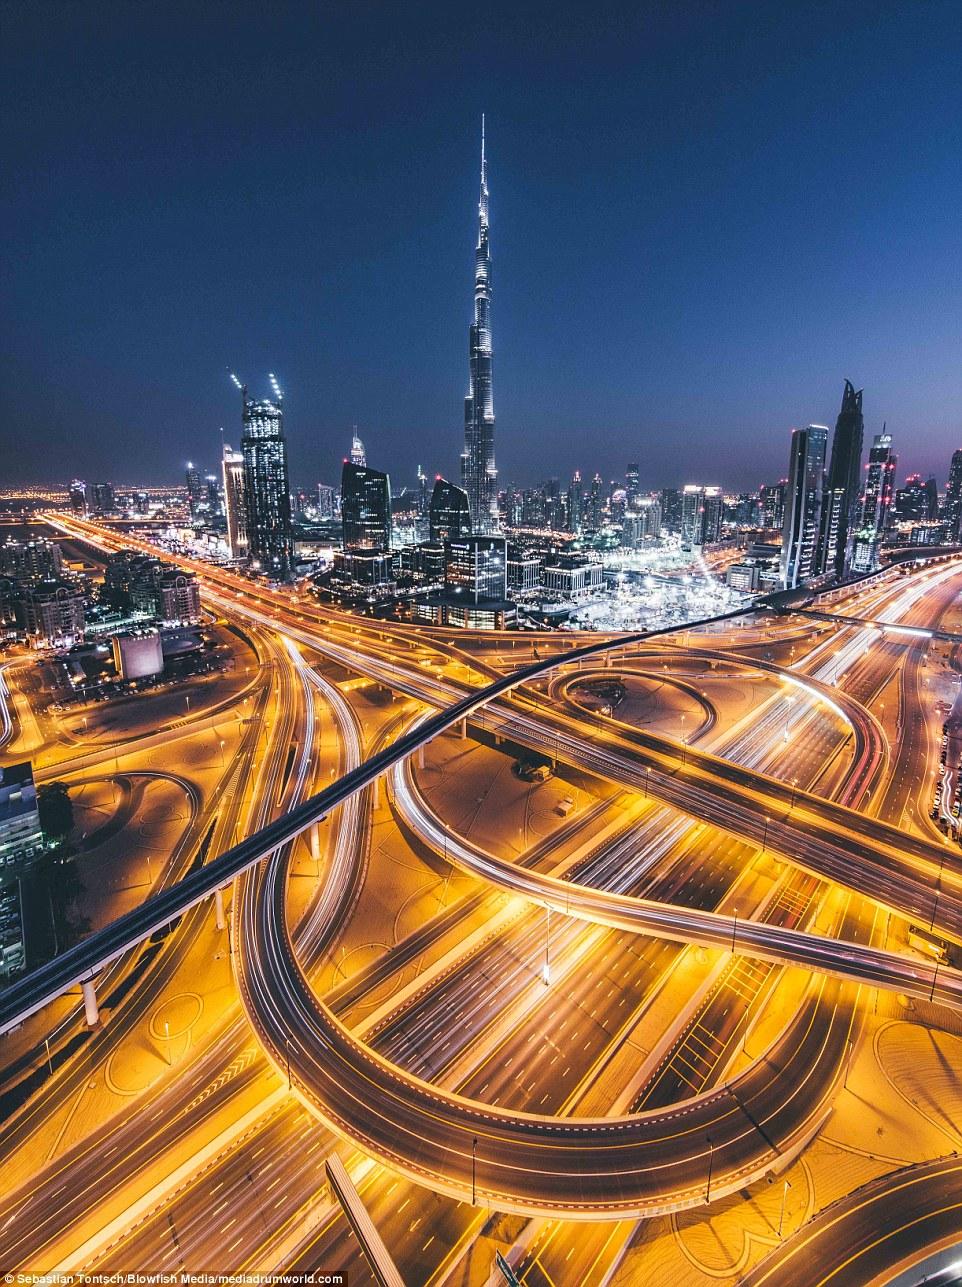 Burj Khalifa Shown In Stunning Photos Of Dubai Above The